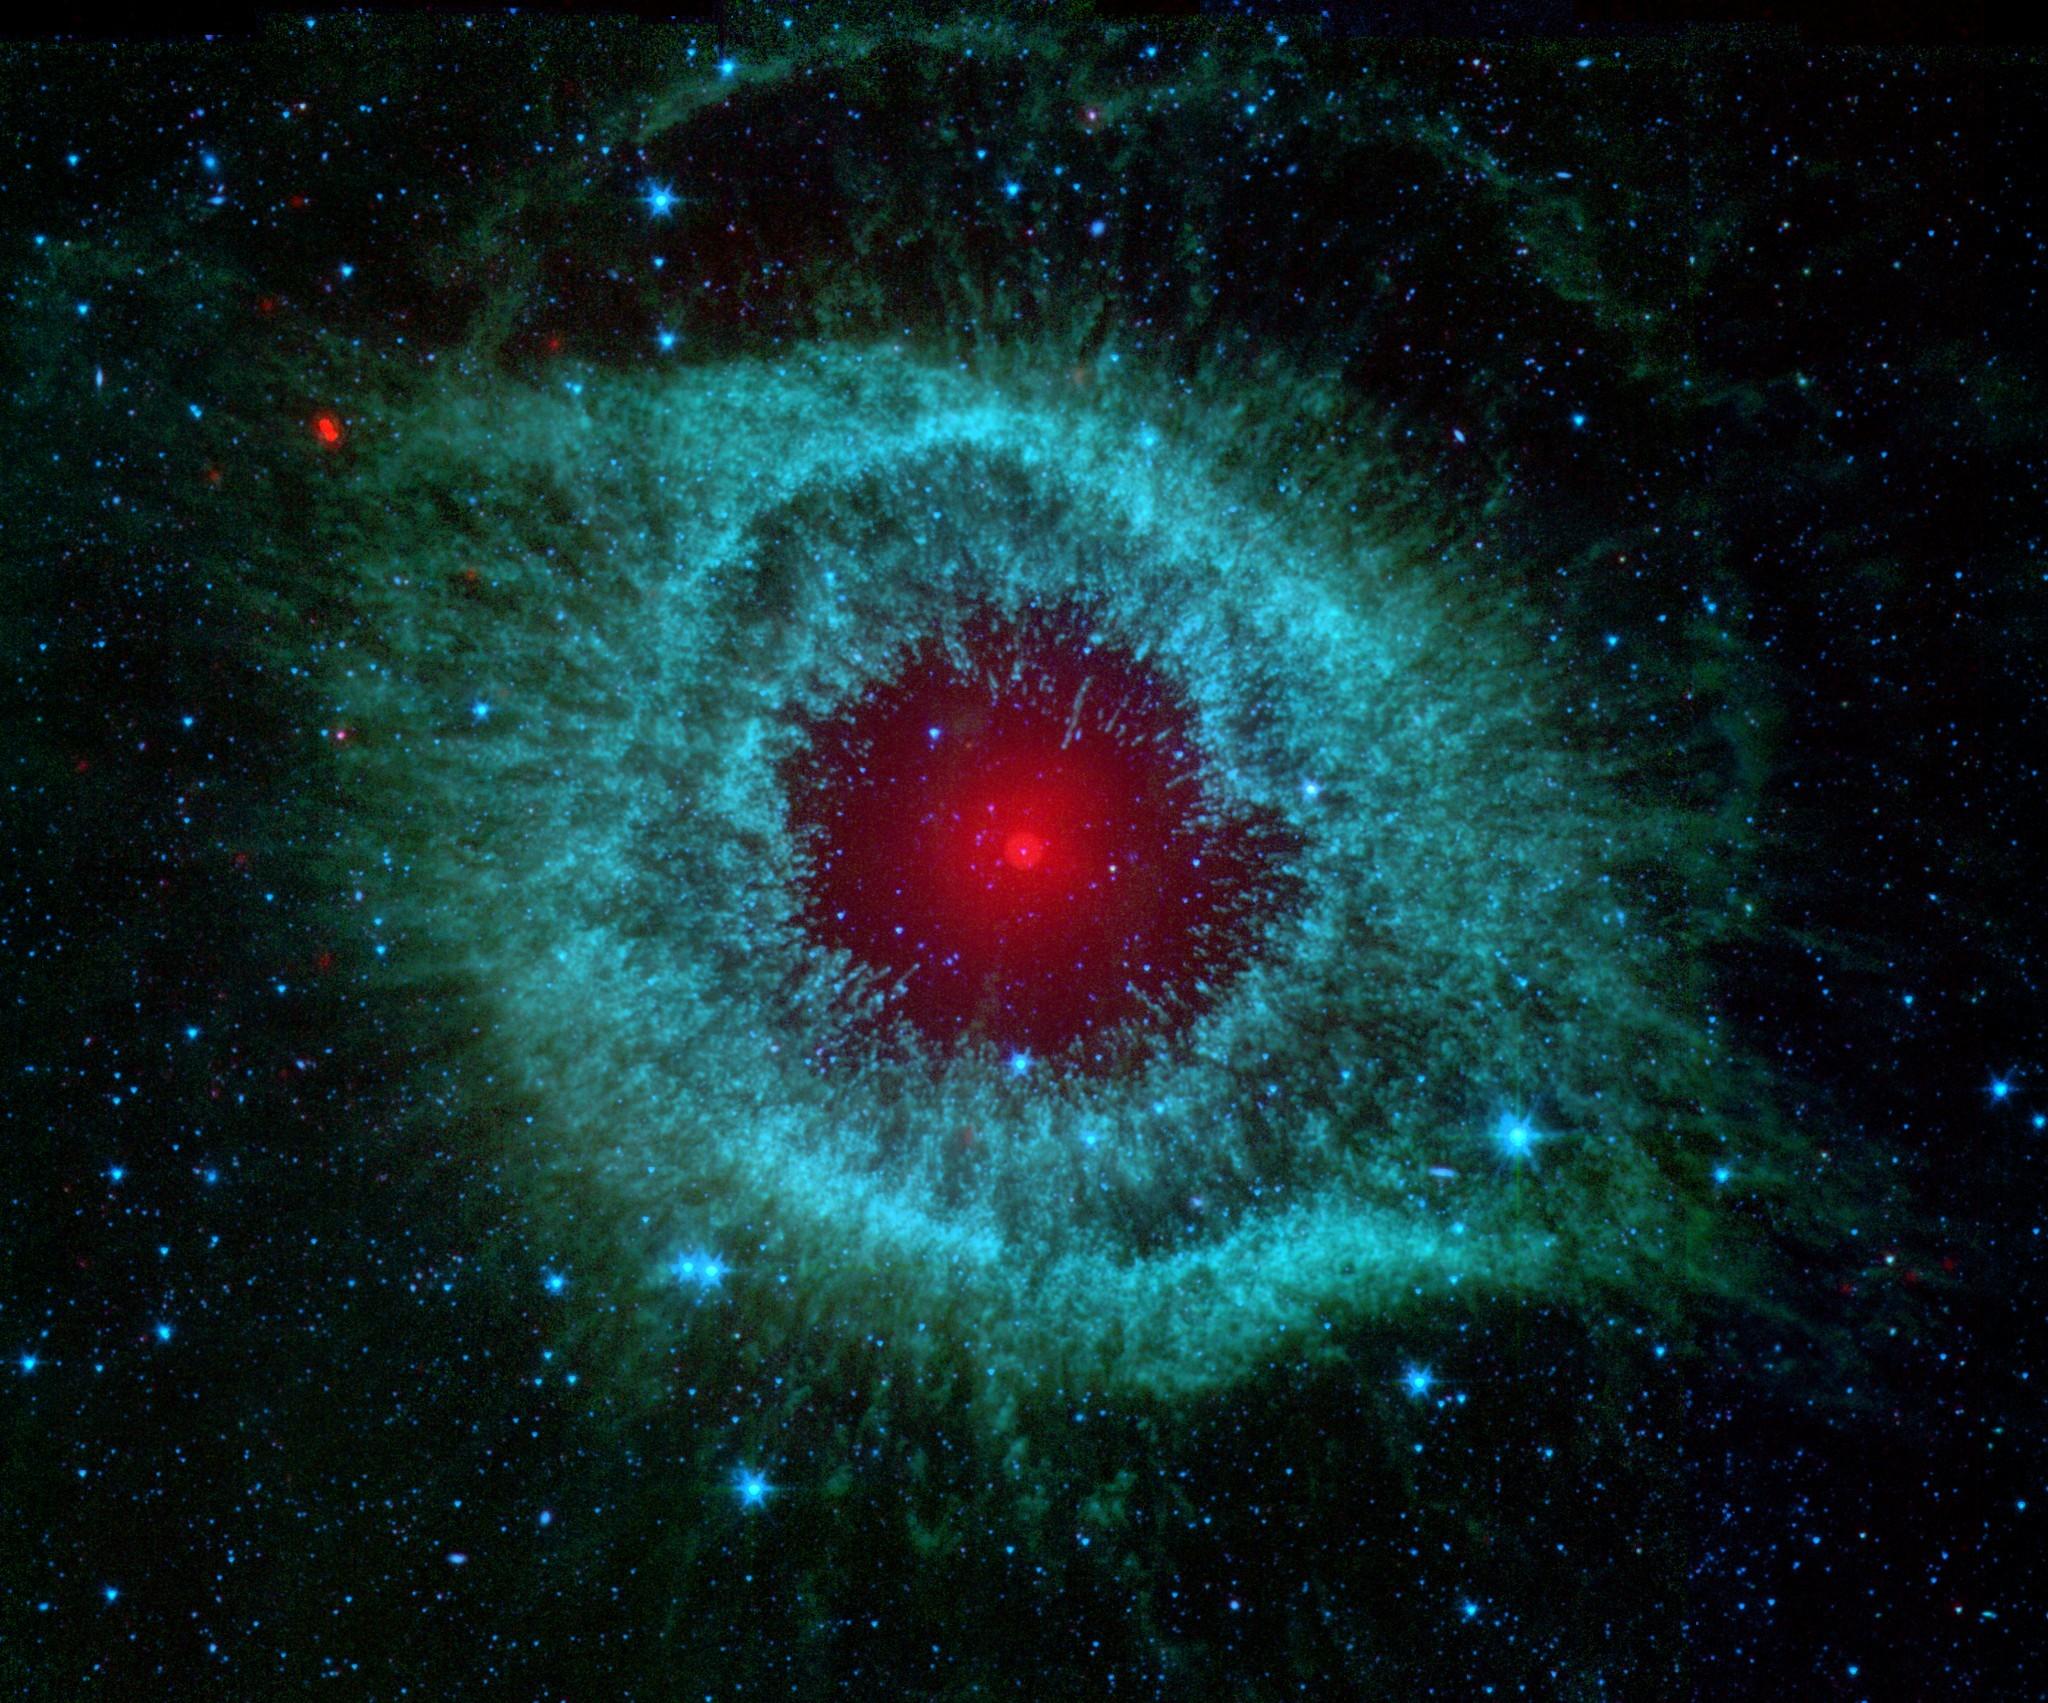 Desktop Wallpaper: Deep space nebula